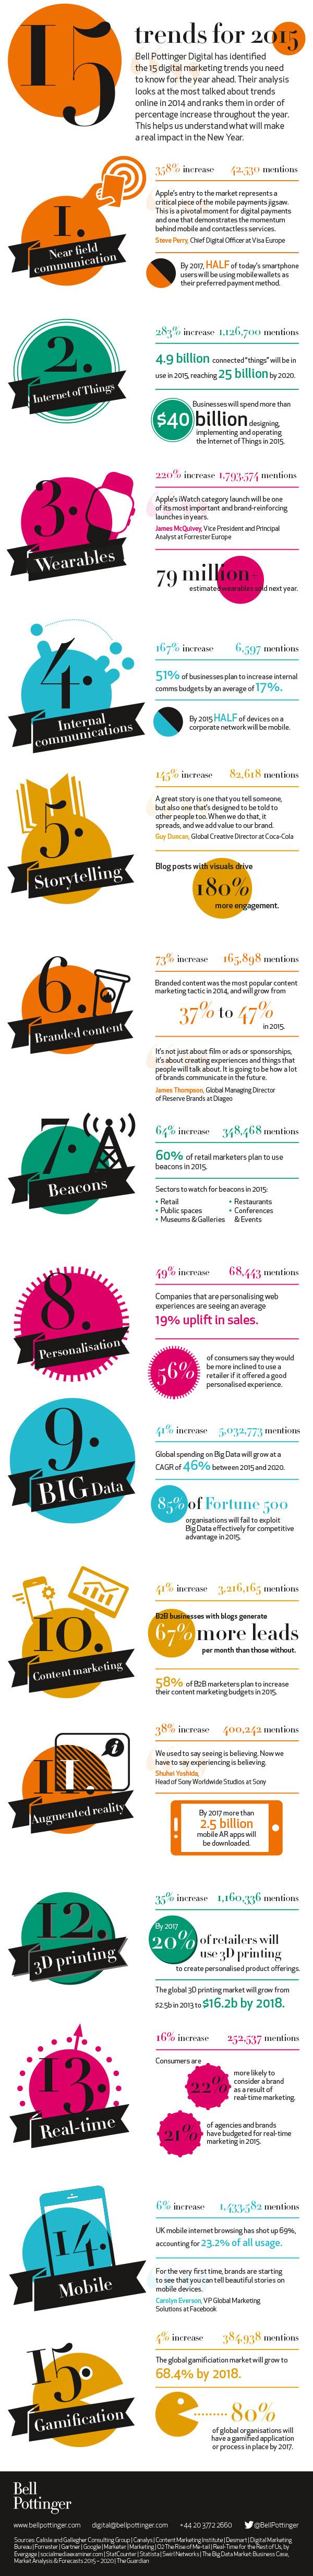 Bell Pottinger Digital - 15 trends for 2015 infographic